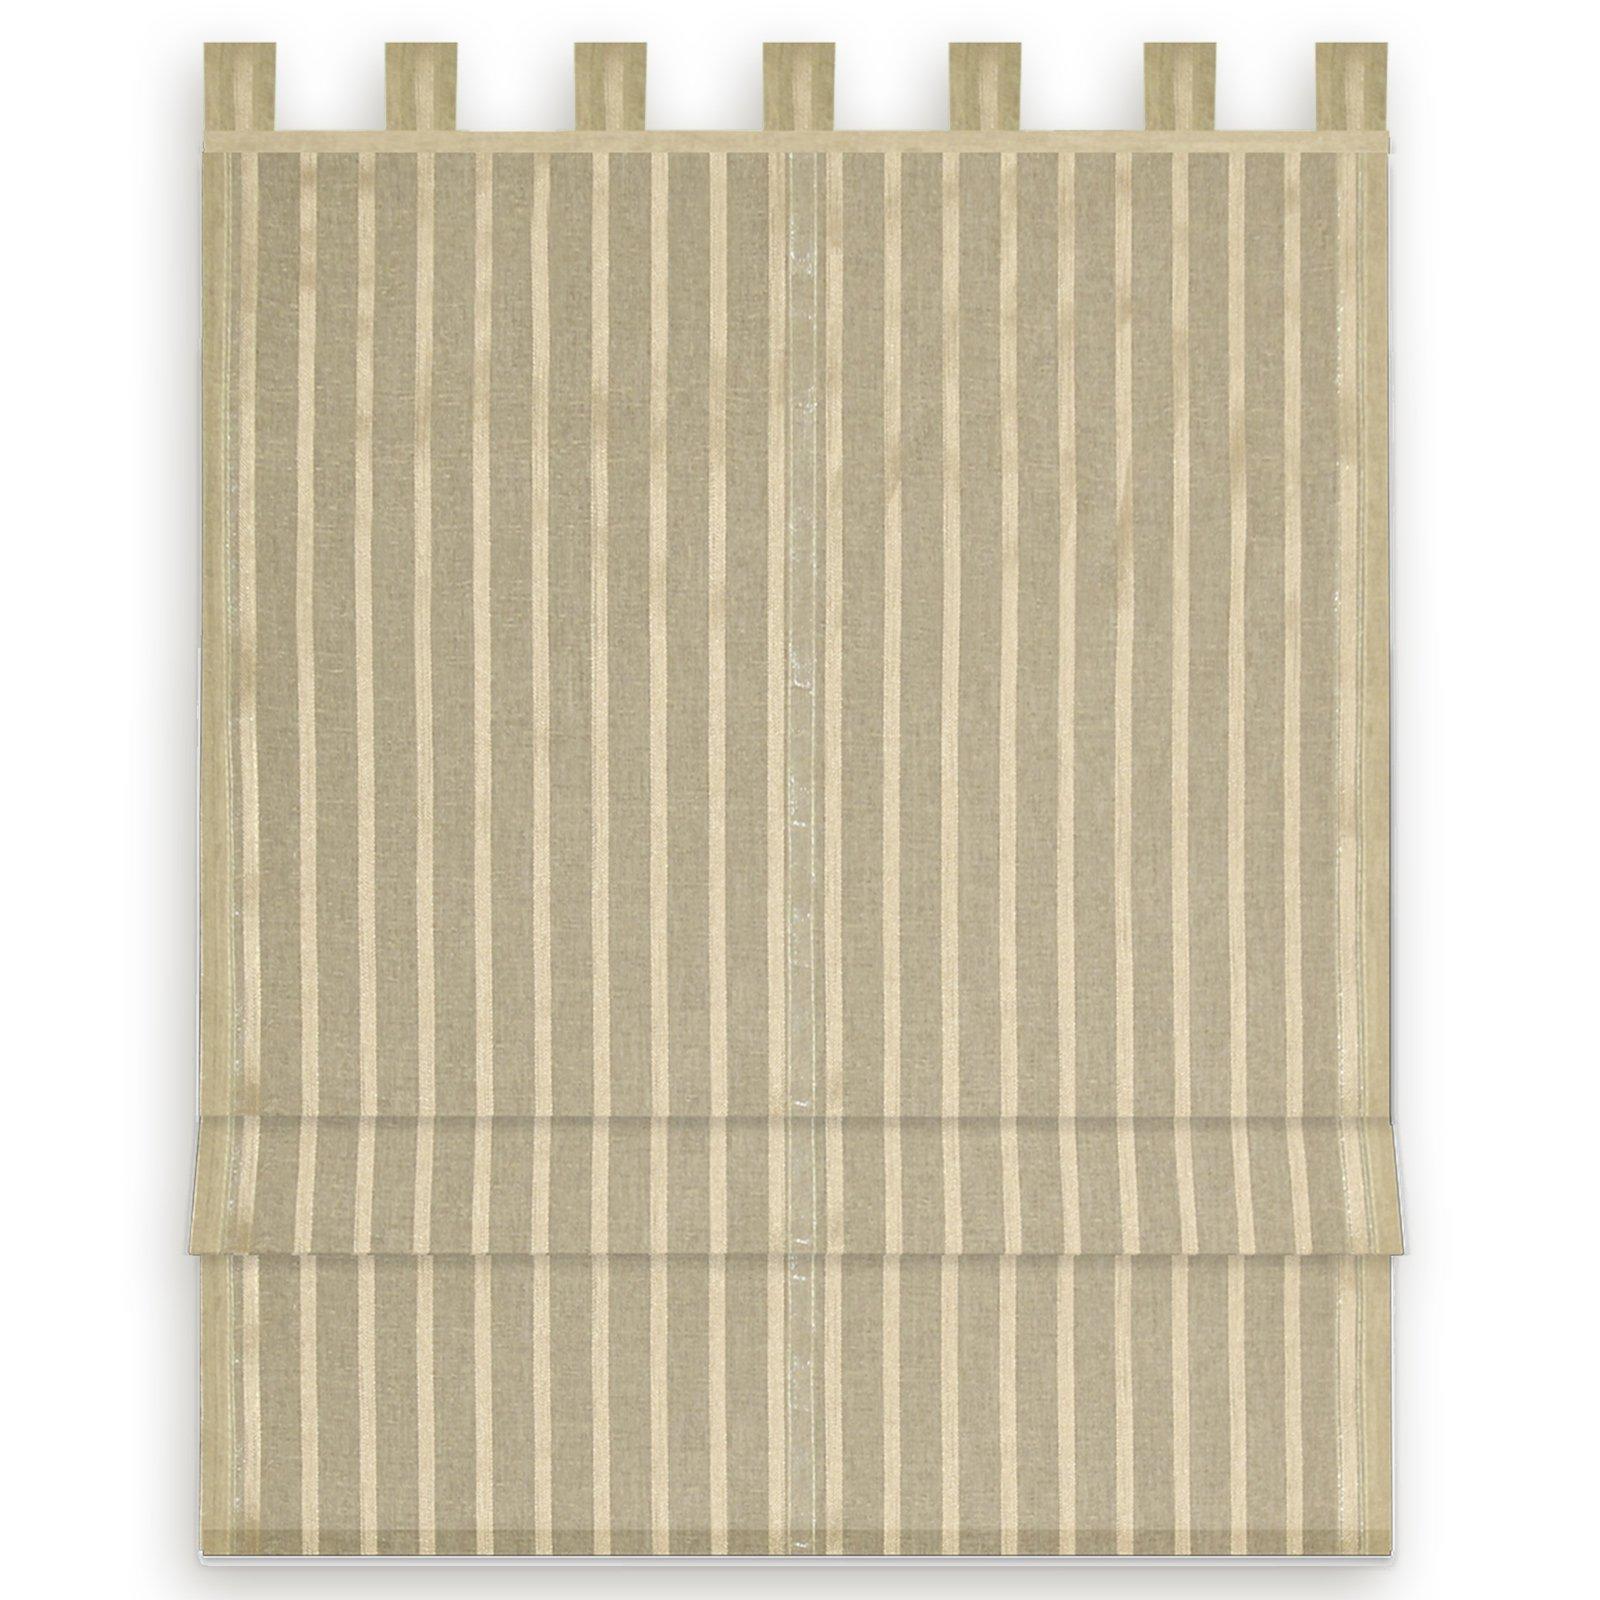 raffrollo bella taupe 100x140 cm sichtschutz raffrollos raffrollos rollos jalousien. Black Bedroom Furniture Sets. Home Design Ideas